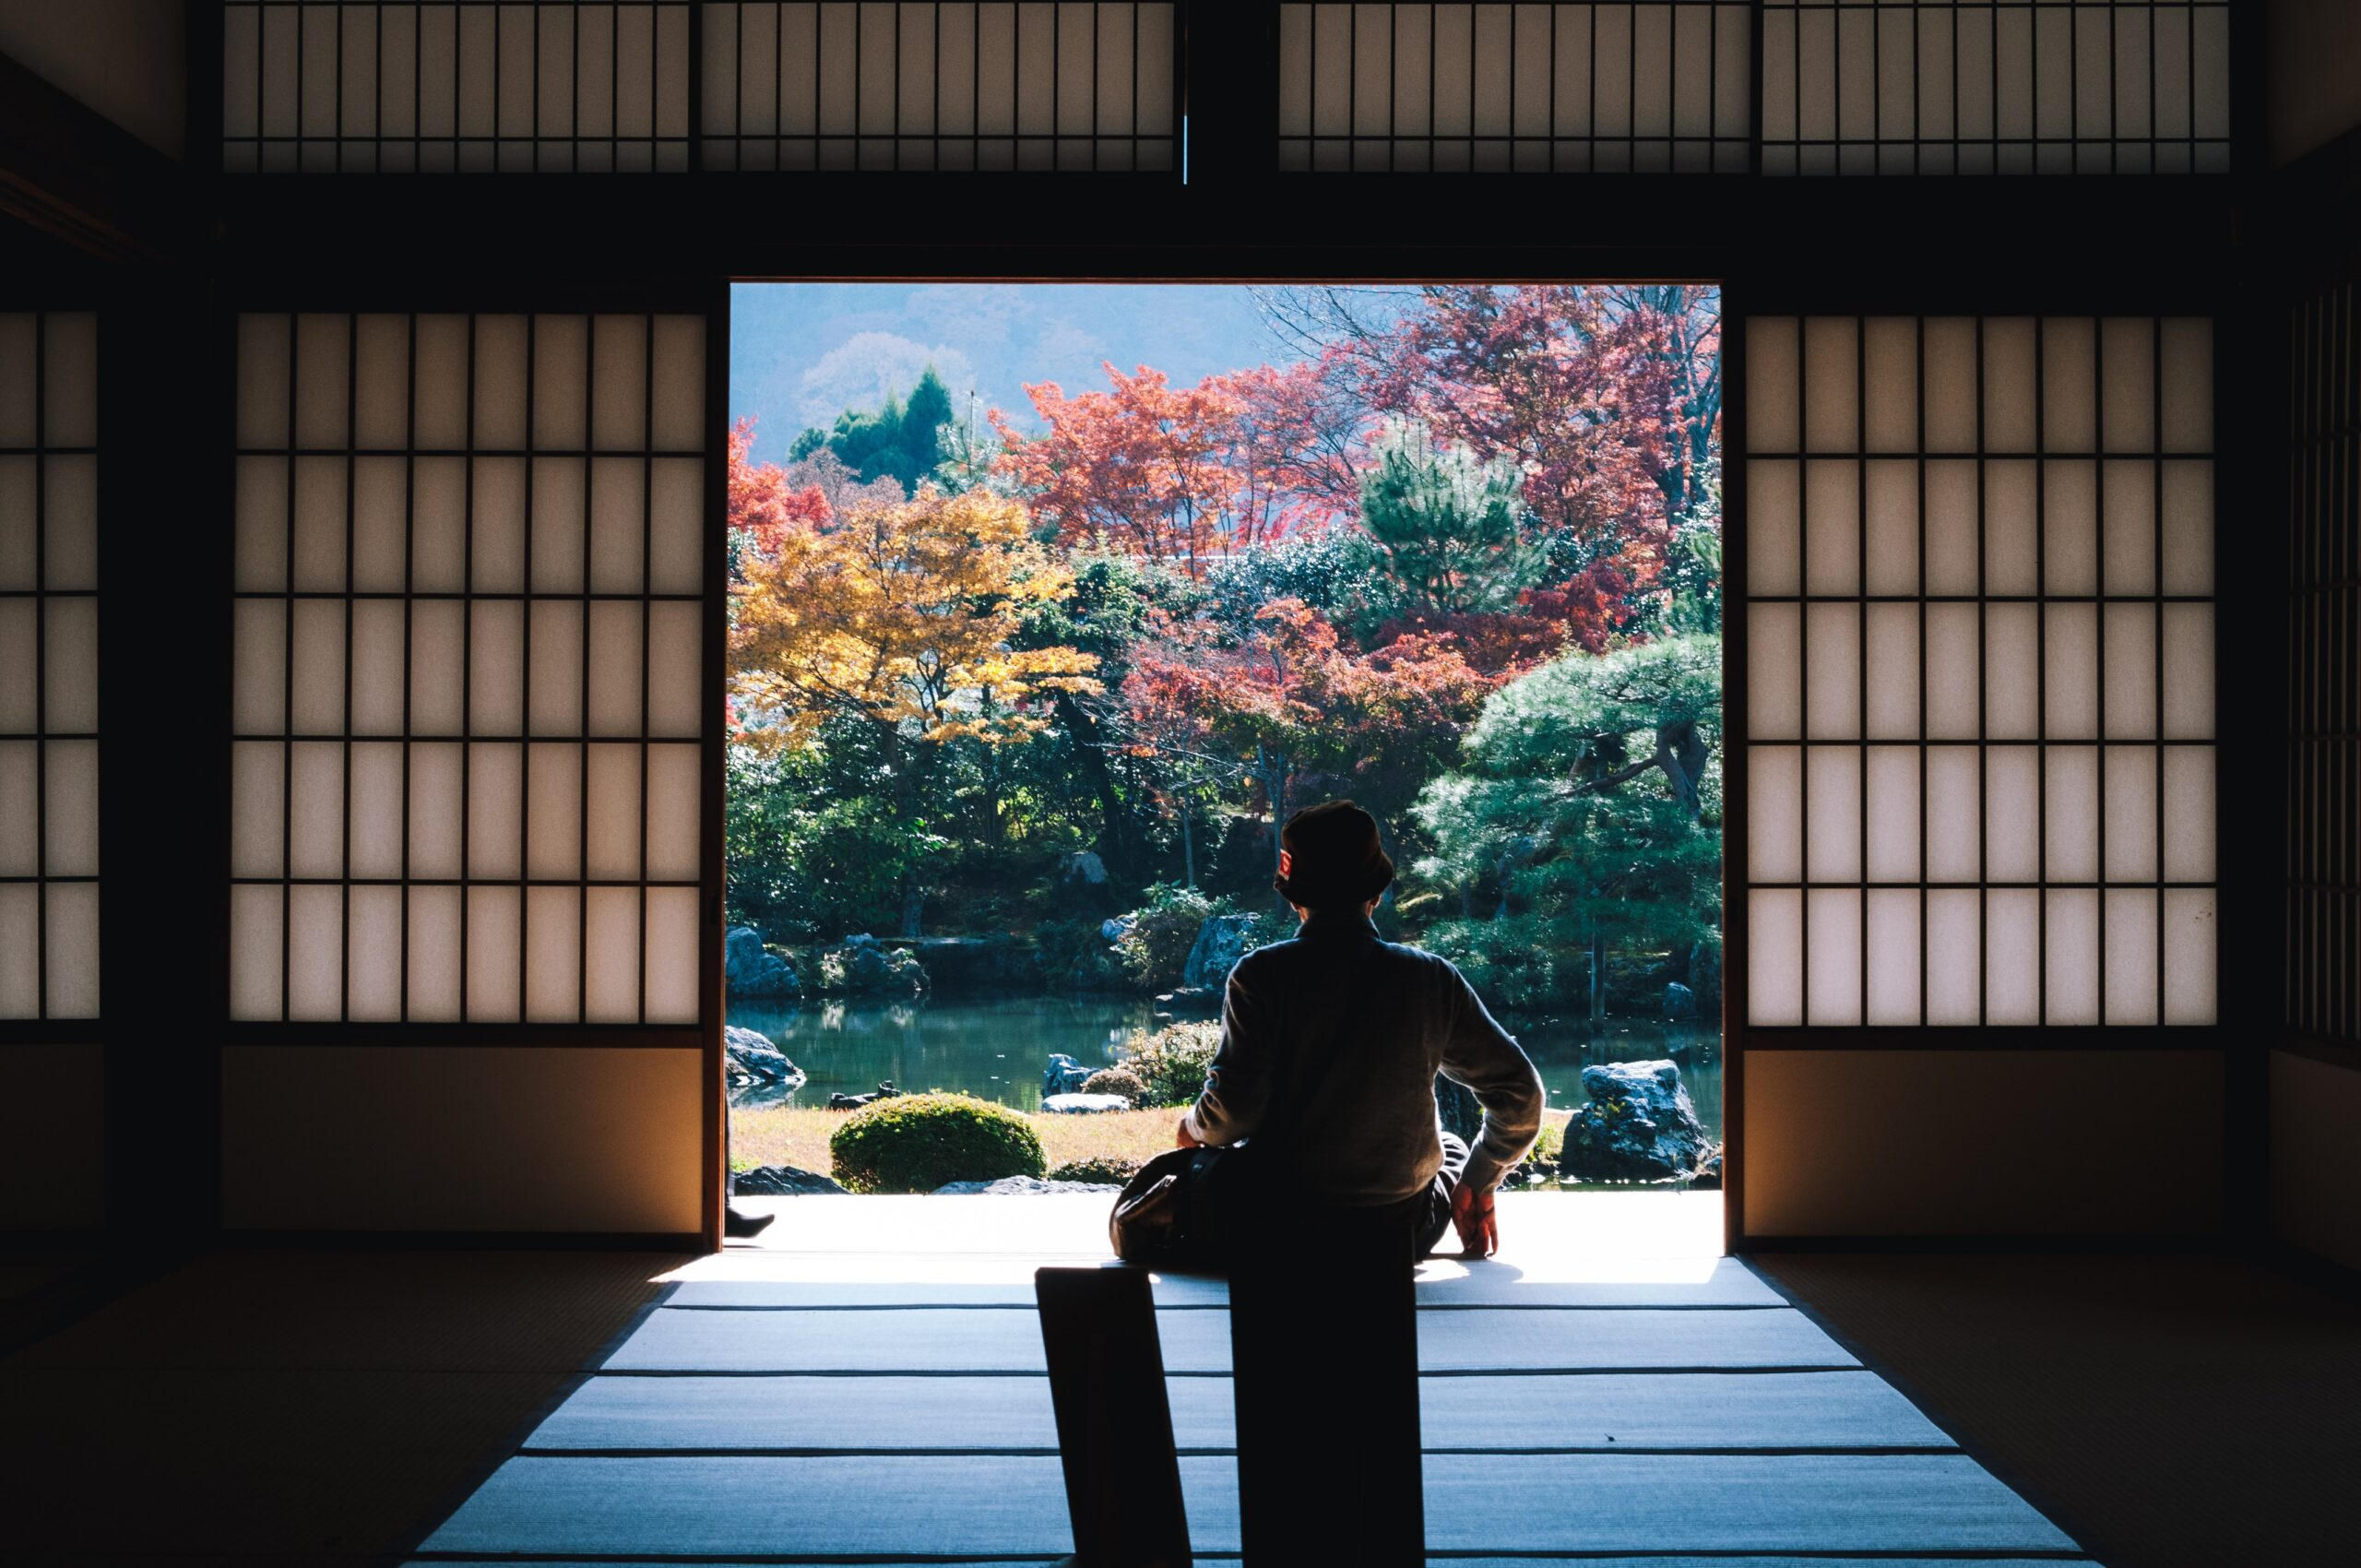 masaaki-komori-Gentleman sitting in Tea house looking out over pond-unsplash